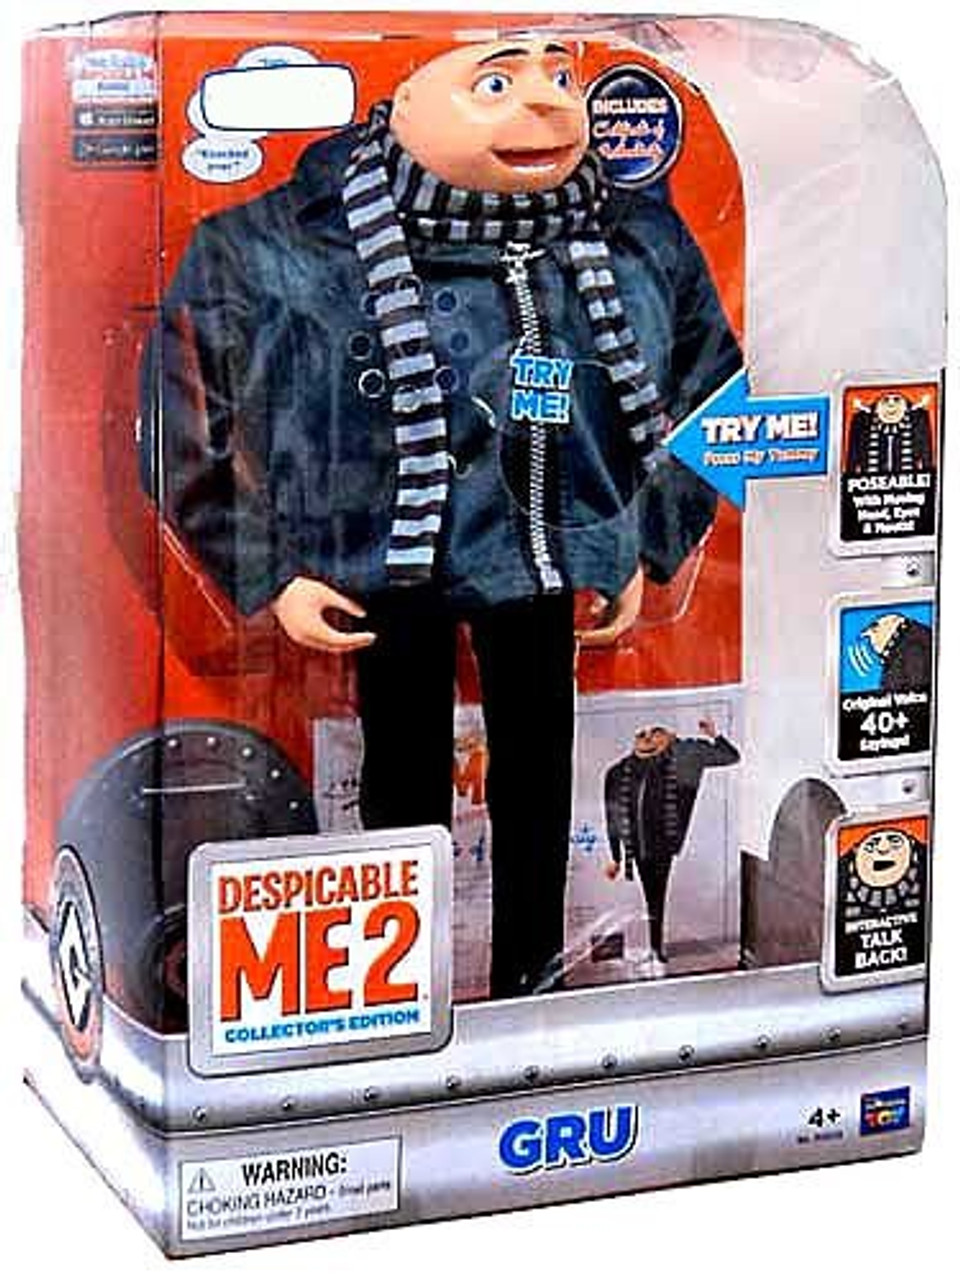 Despicable Me 2 Gru Exclusive Action Figure